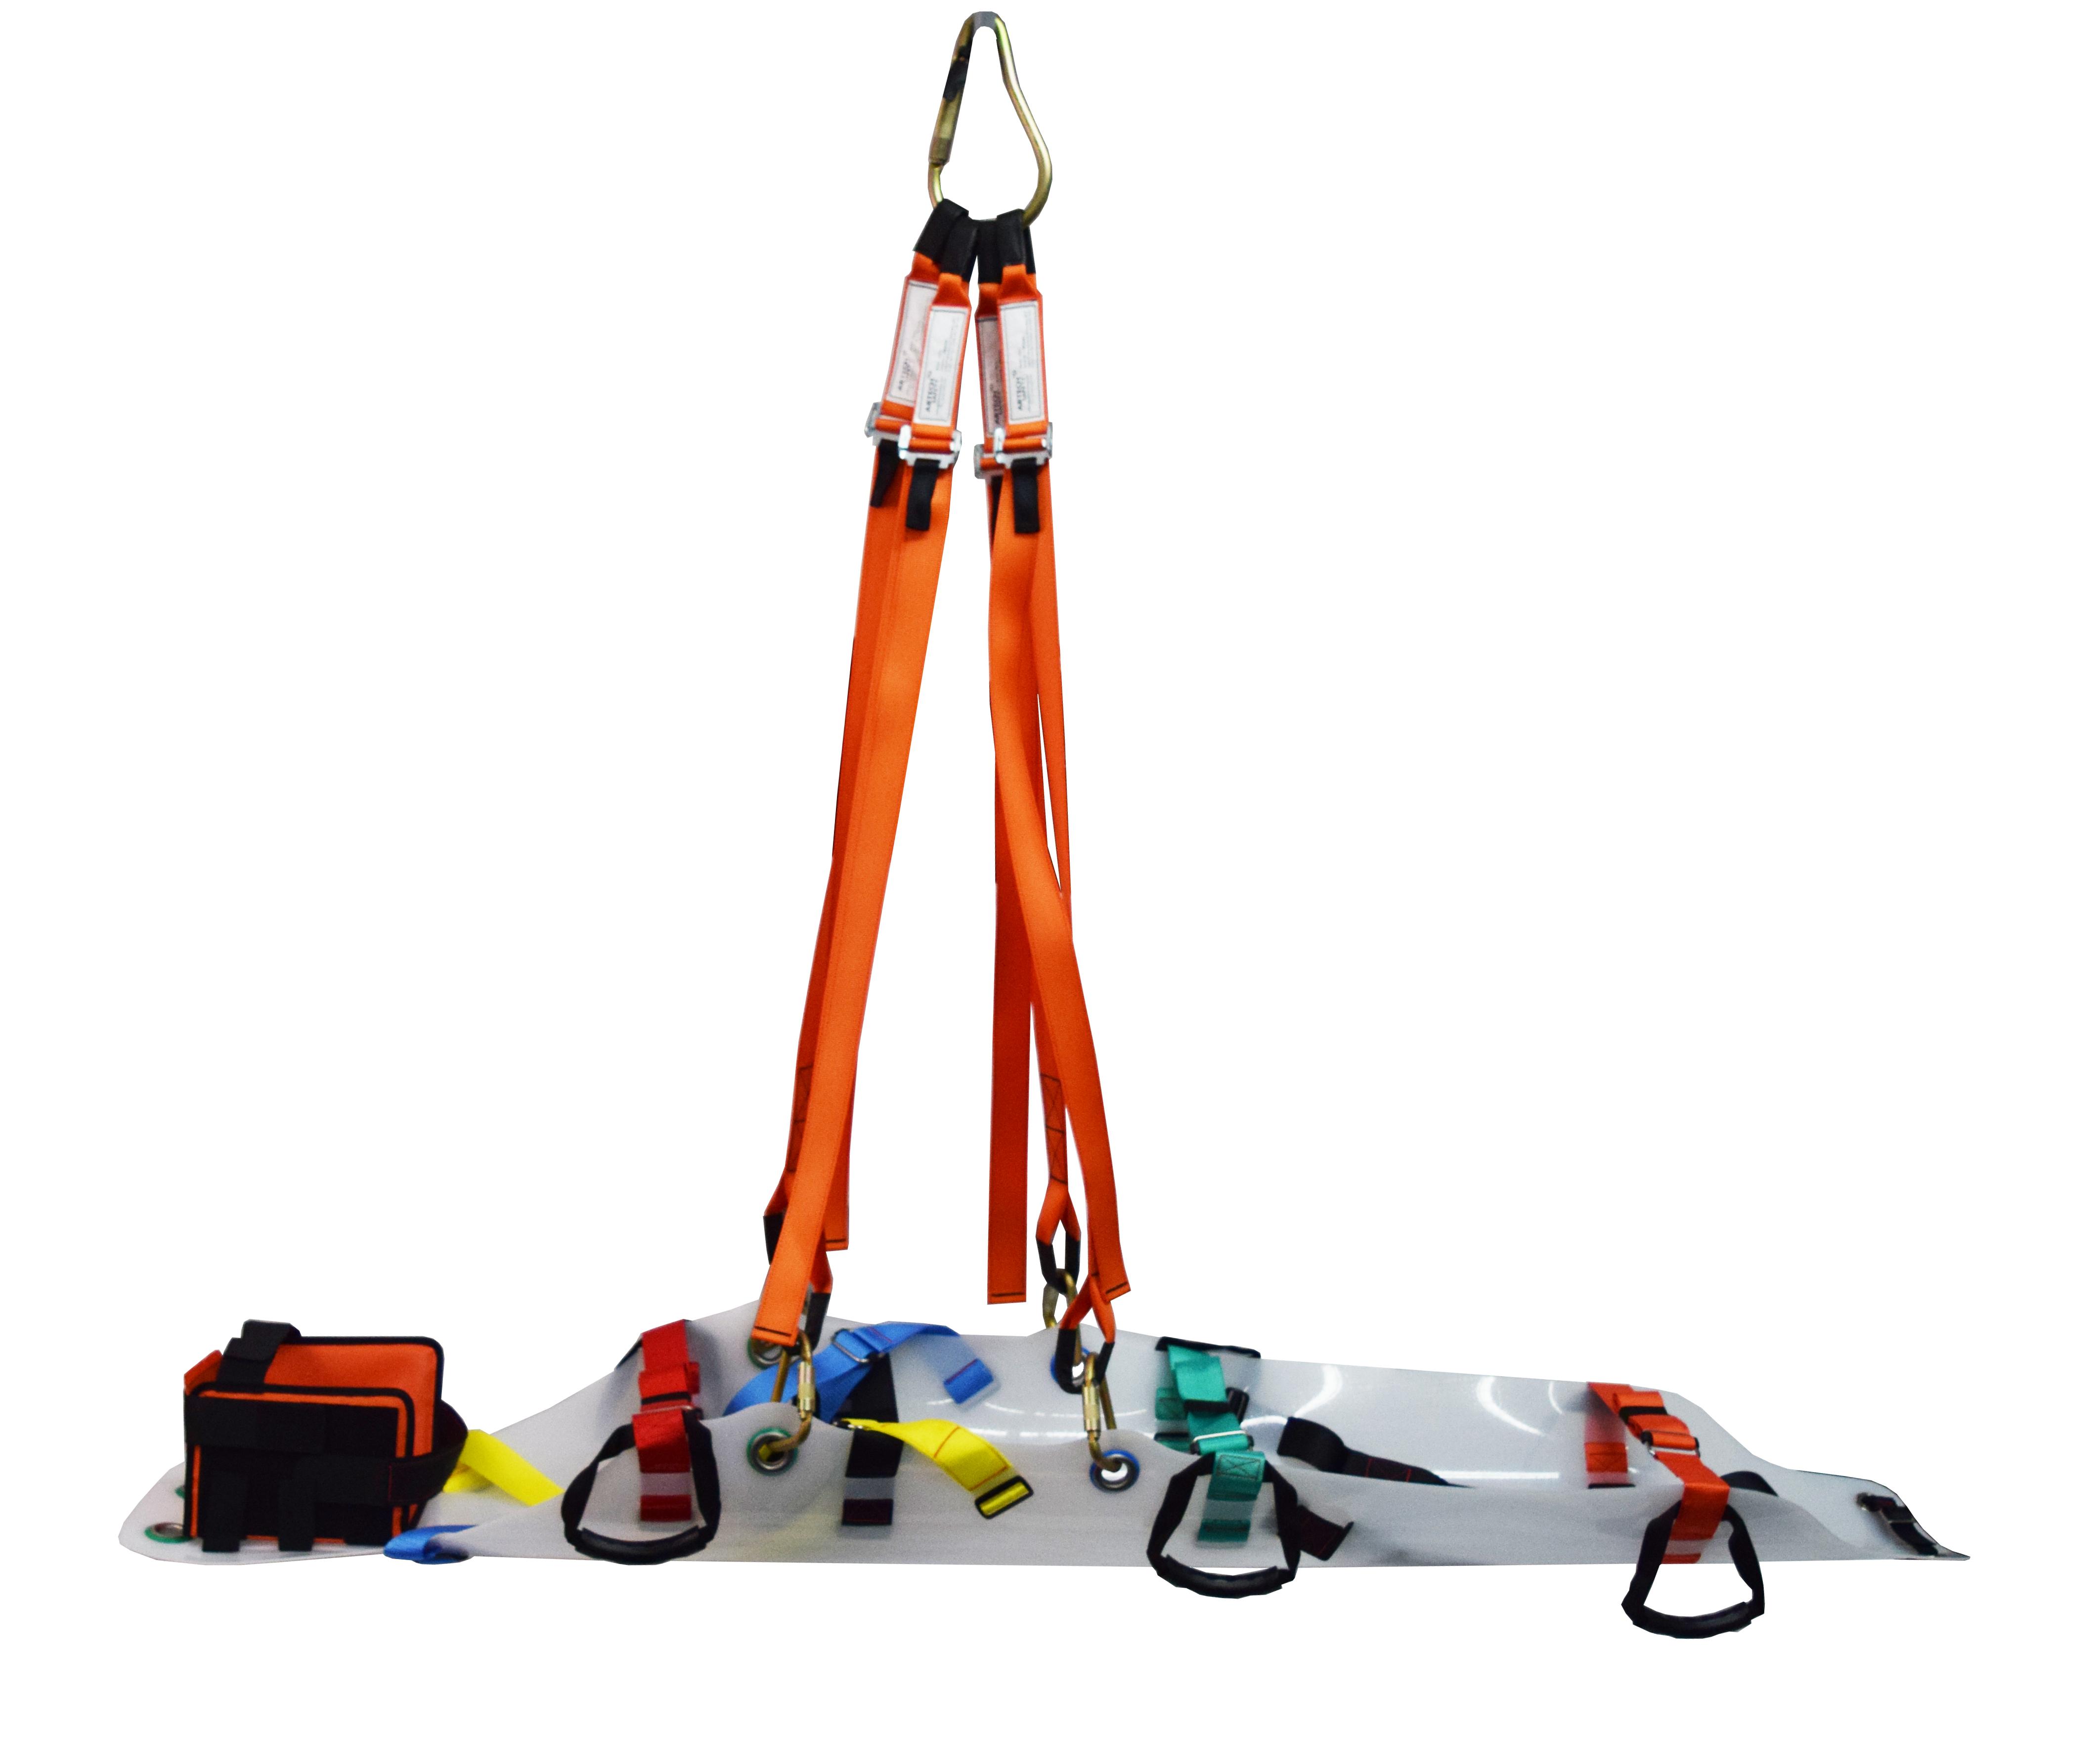 Technical & Adjustable Harness